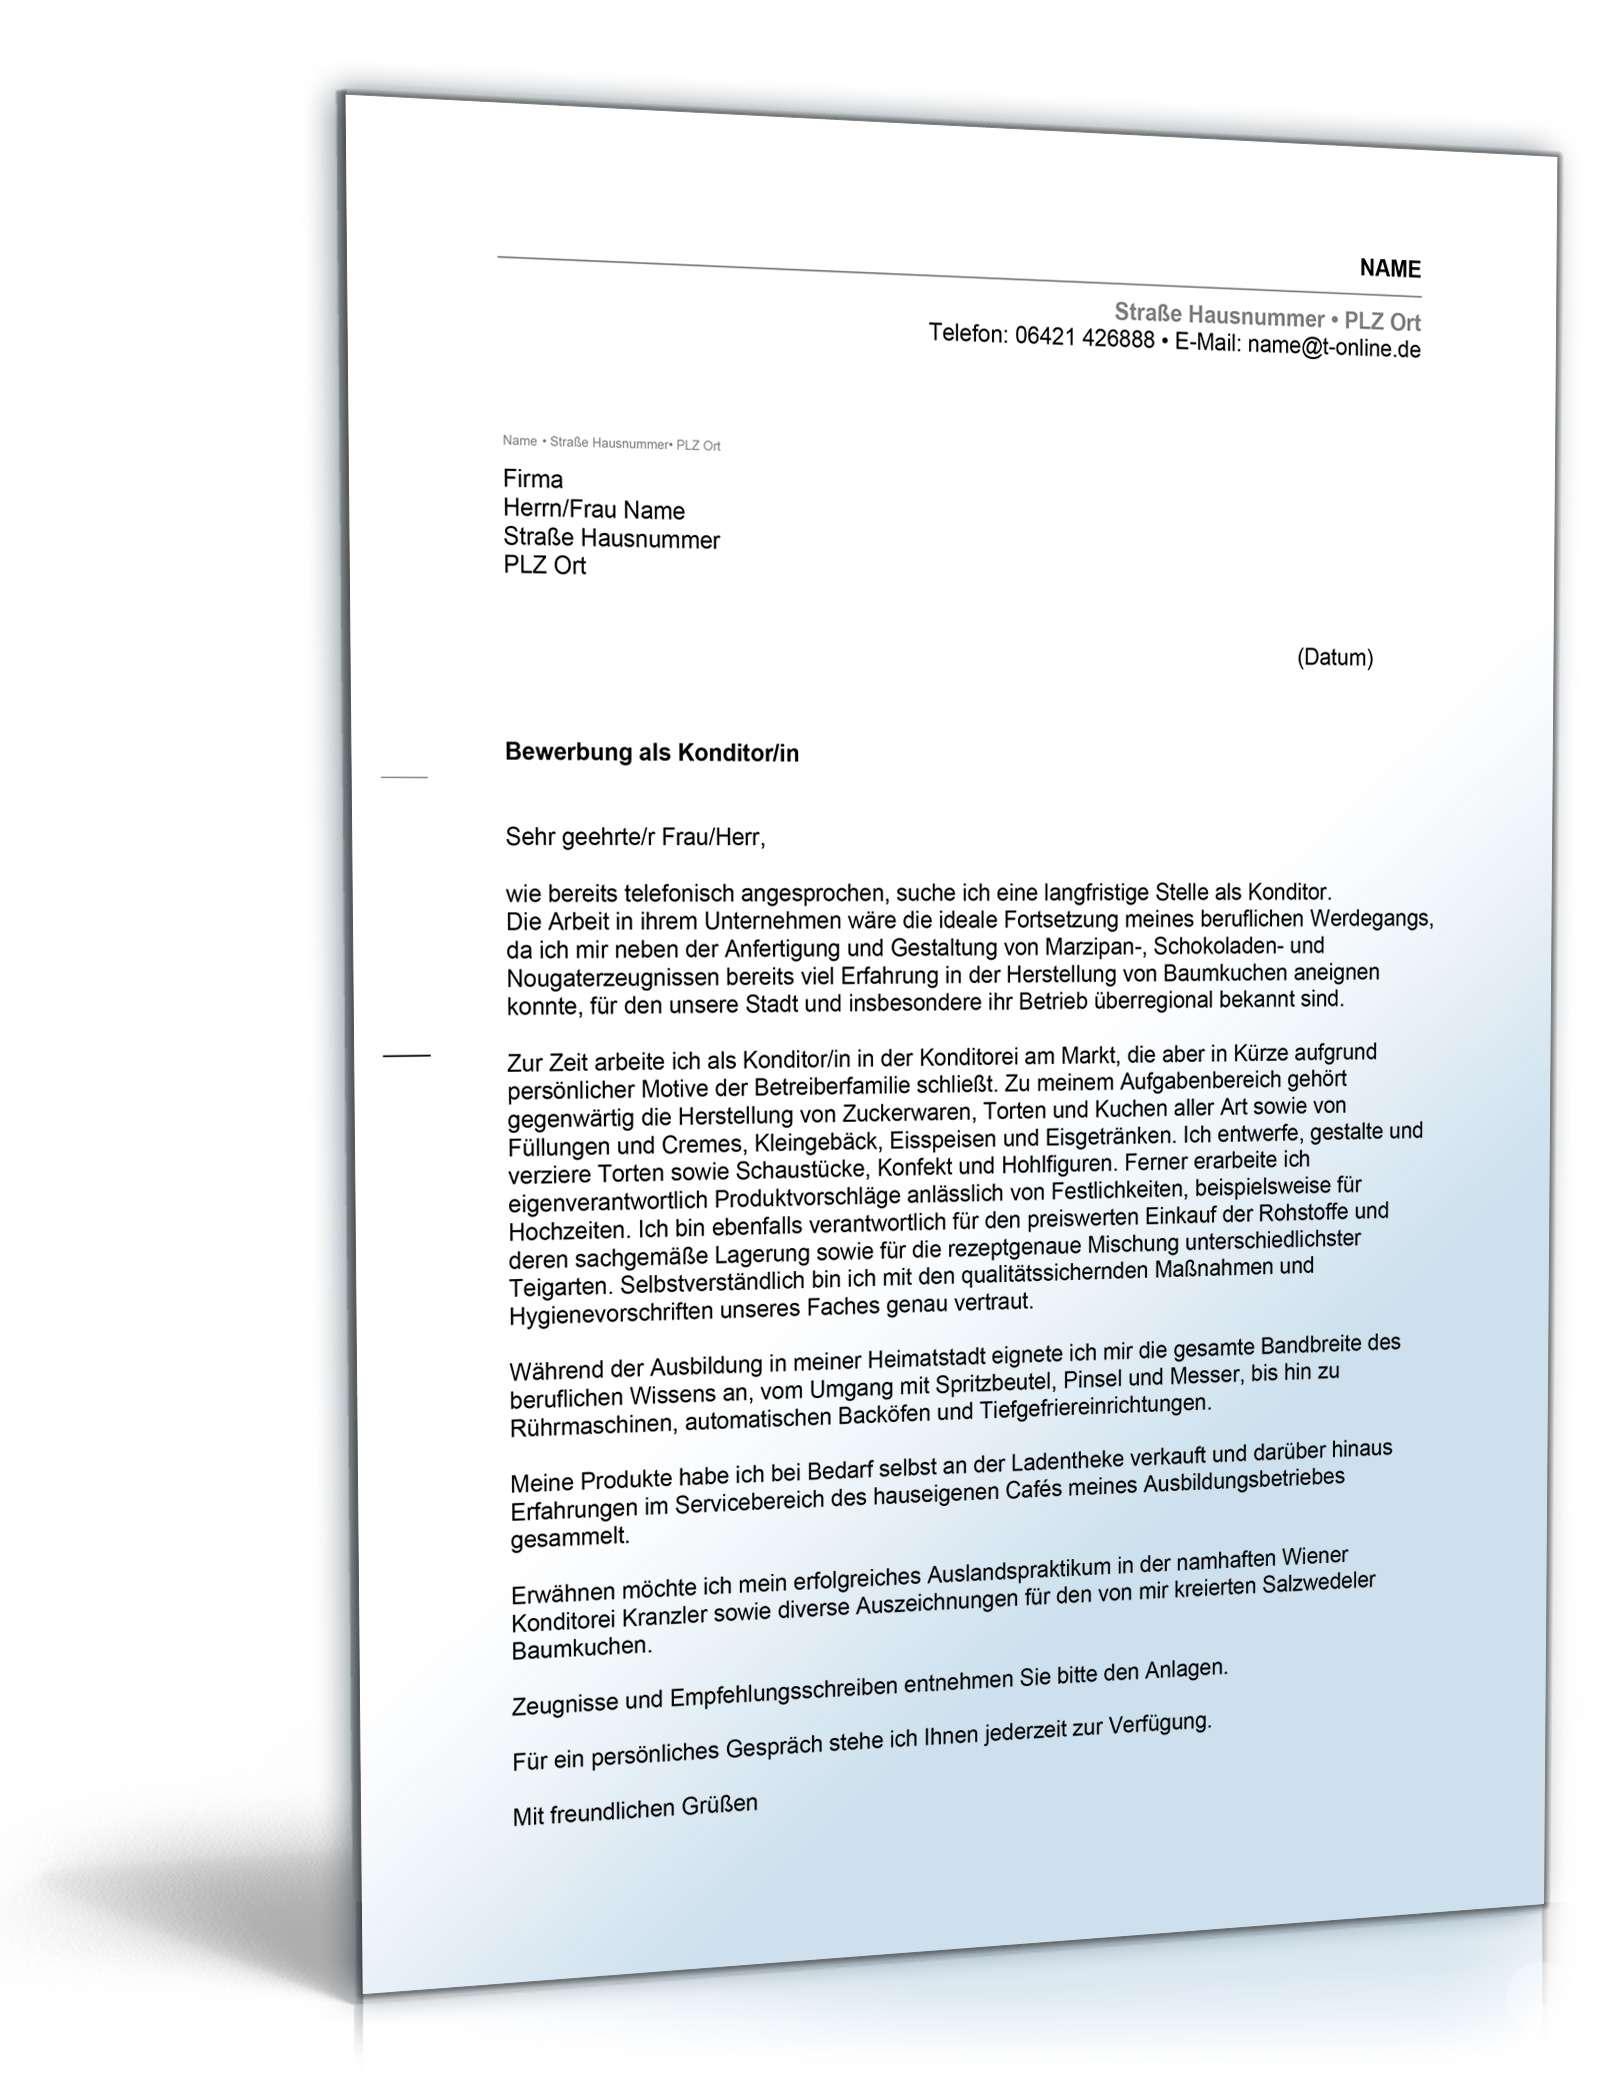 bewerbung konditor muster Anschreiben Bewerbung Konditor | Muster zum Download